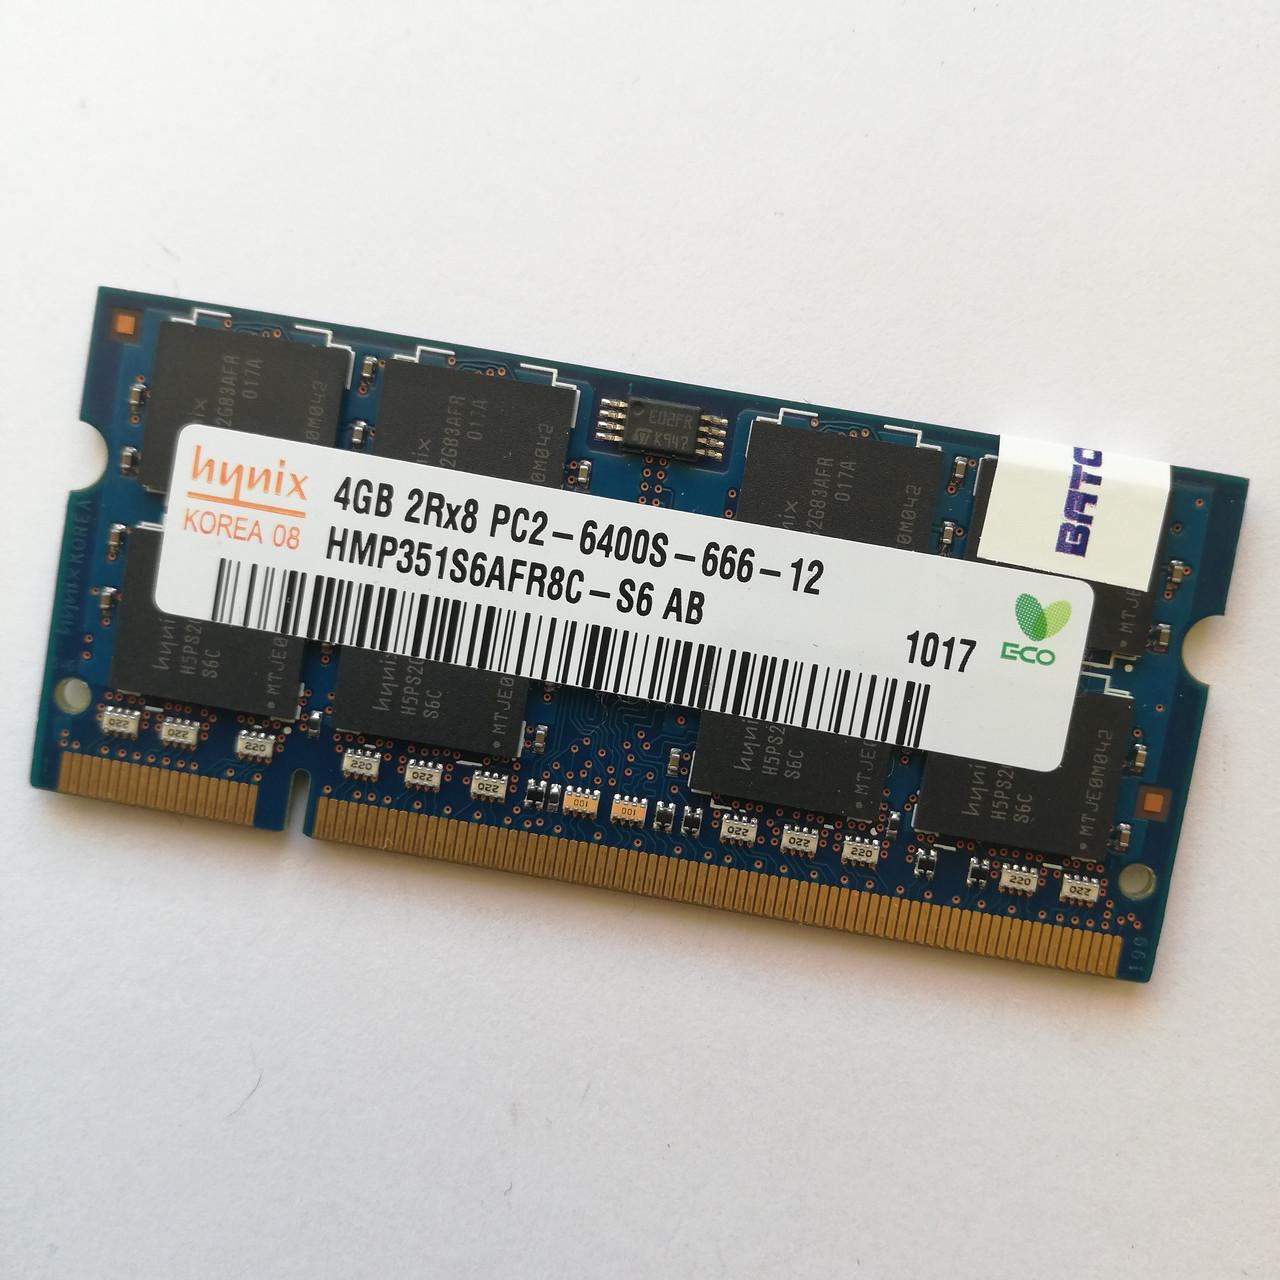 Оперативная память для ноутбука Hynix SODIMM DDR2 4Gb 800MHz 6400s CL6 (HMP351S6AFR8C-S6 AB) Б/У